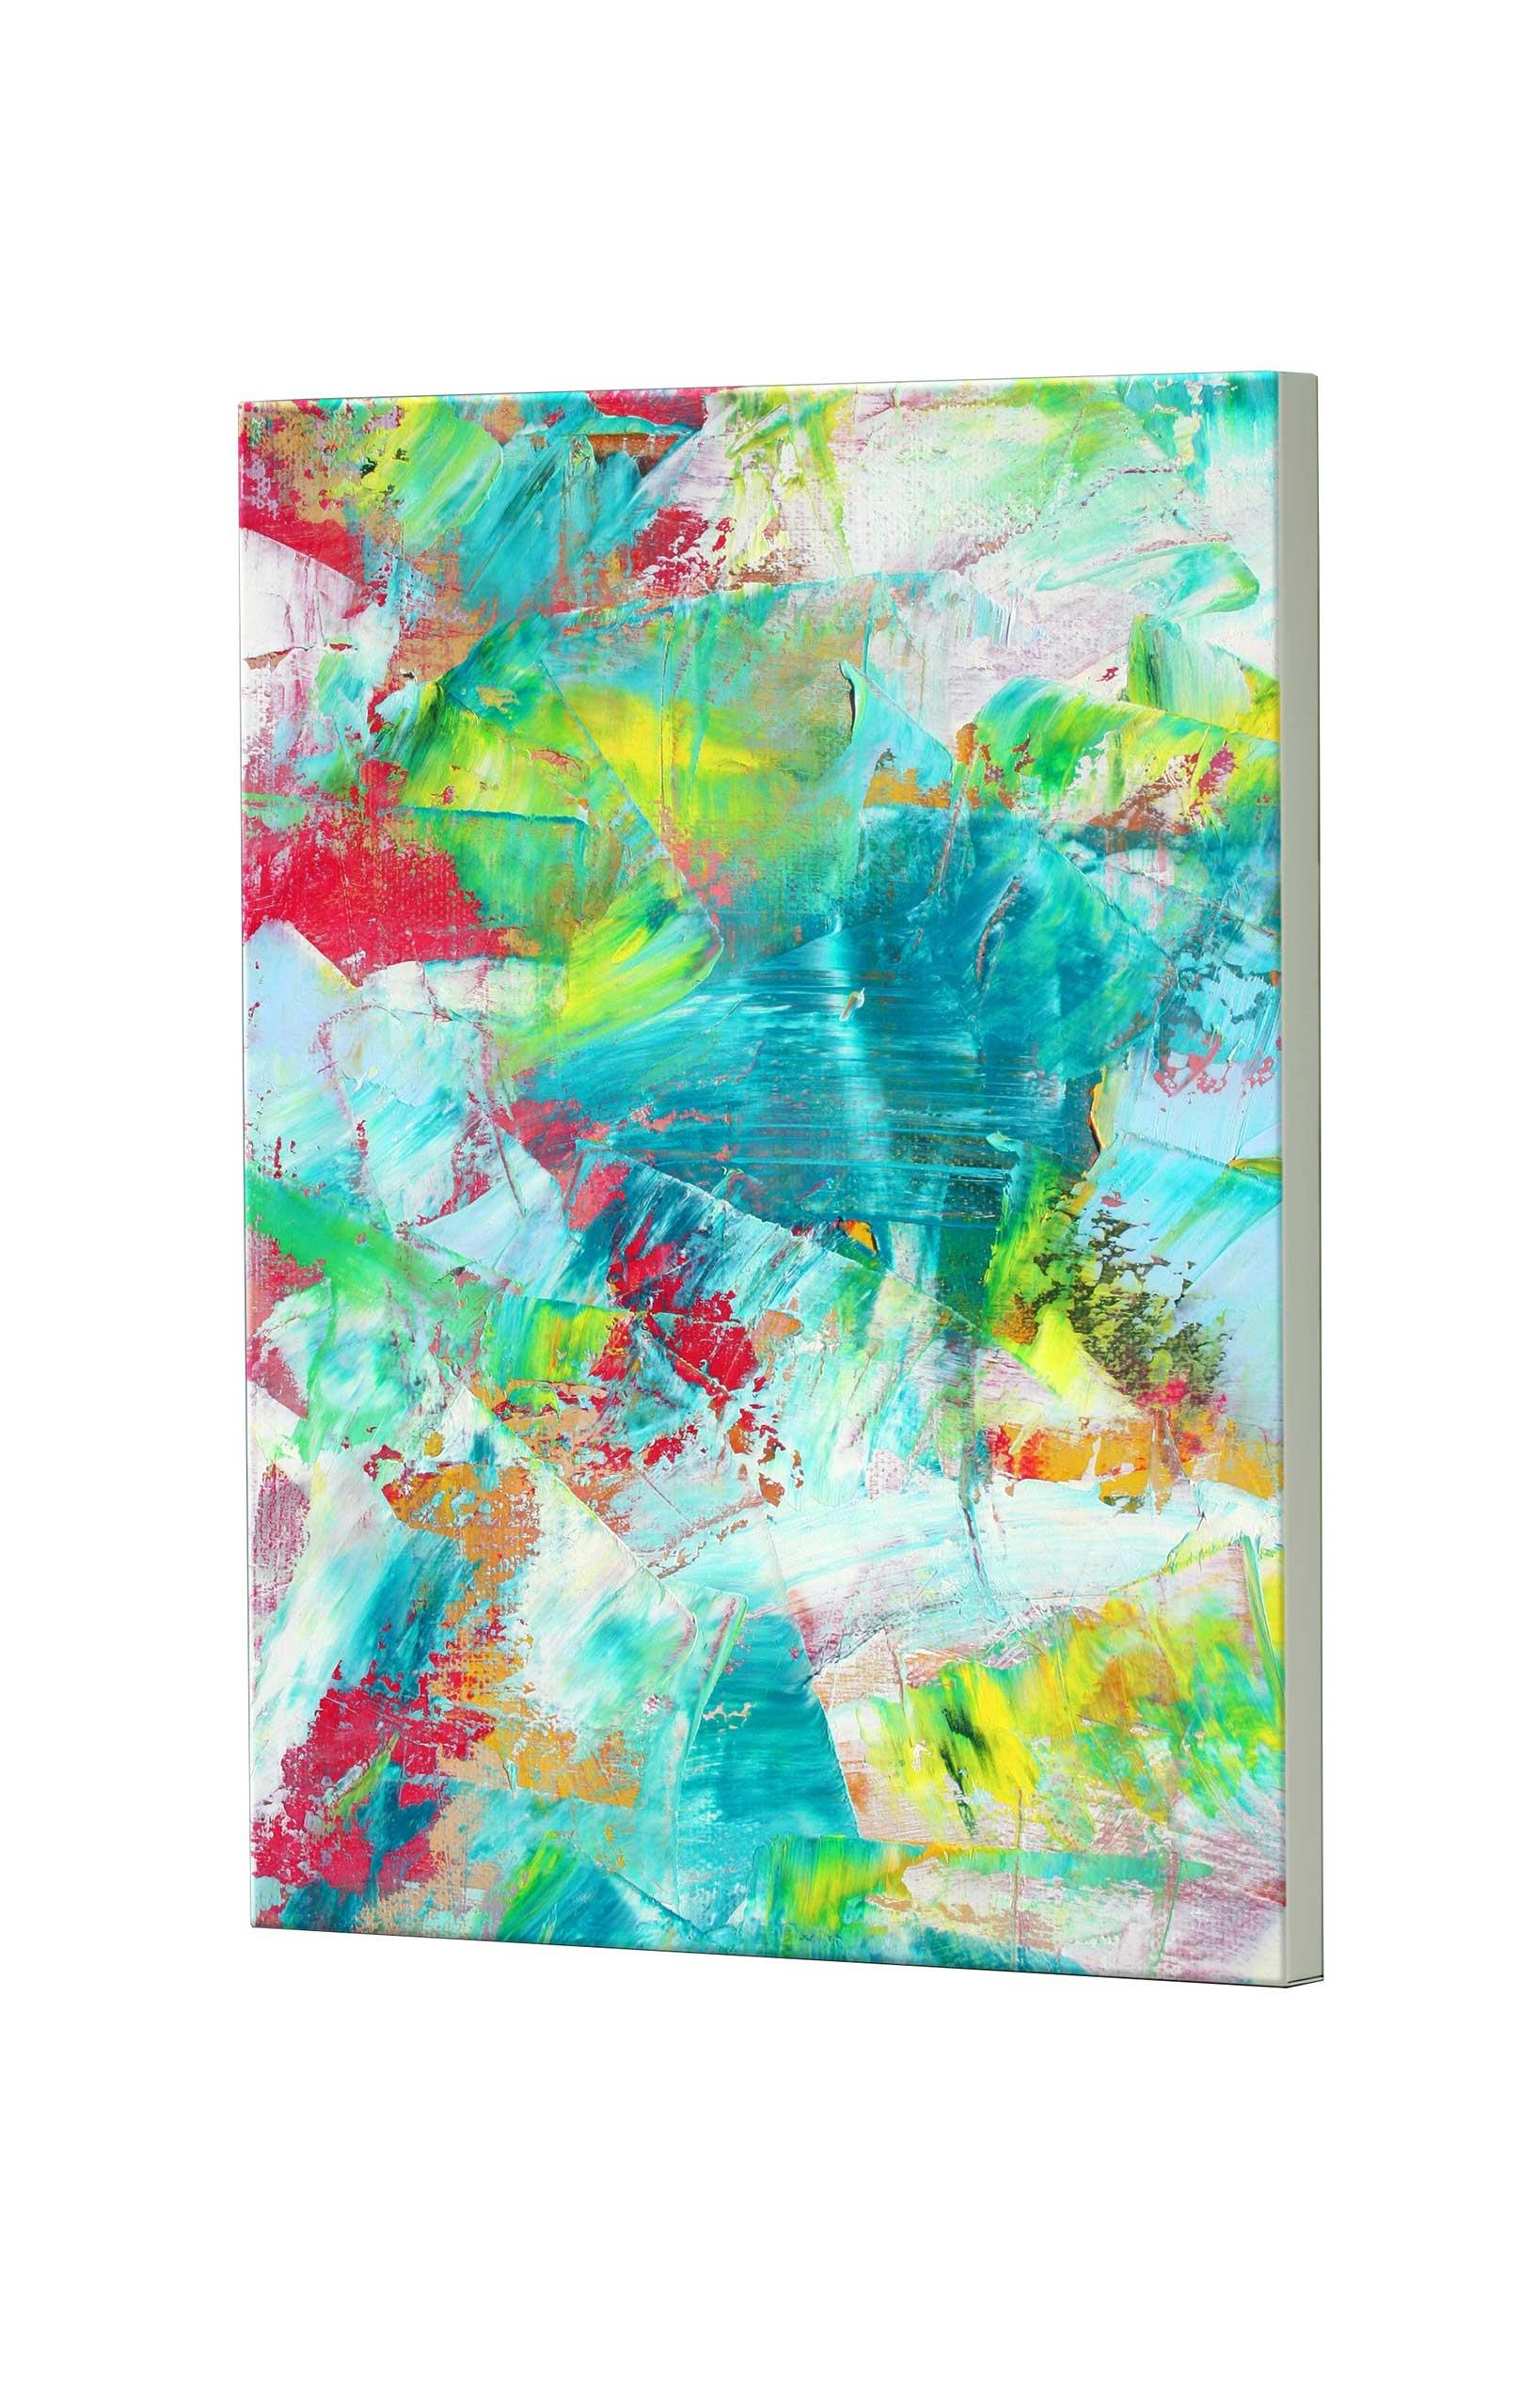 Magnettafel NOTIZ 60x80cm Motiv Gemälde Kunst MDH102 Motiv-Pinnwand